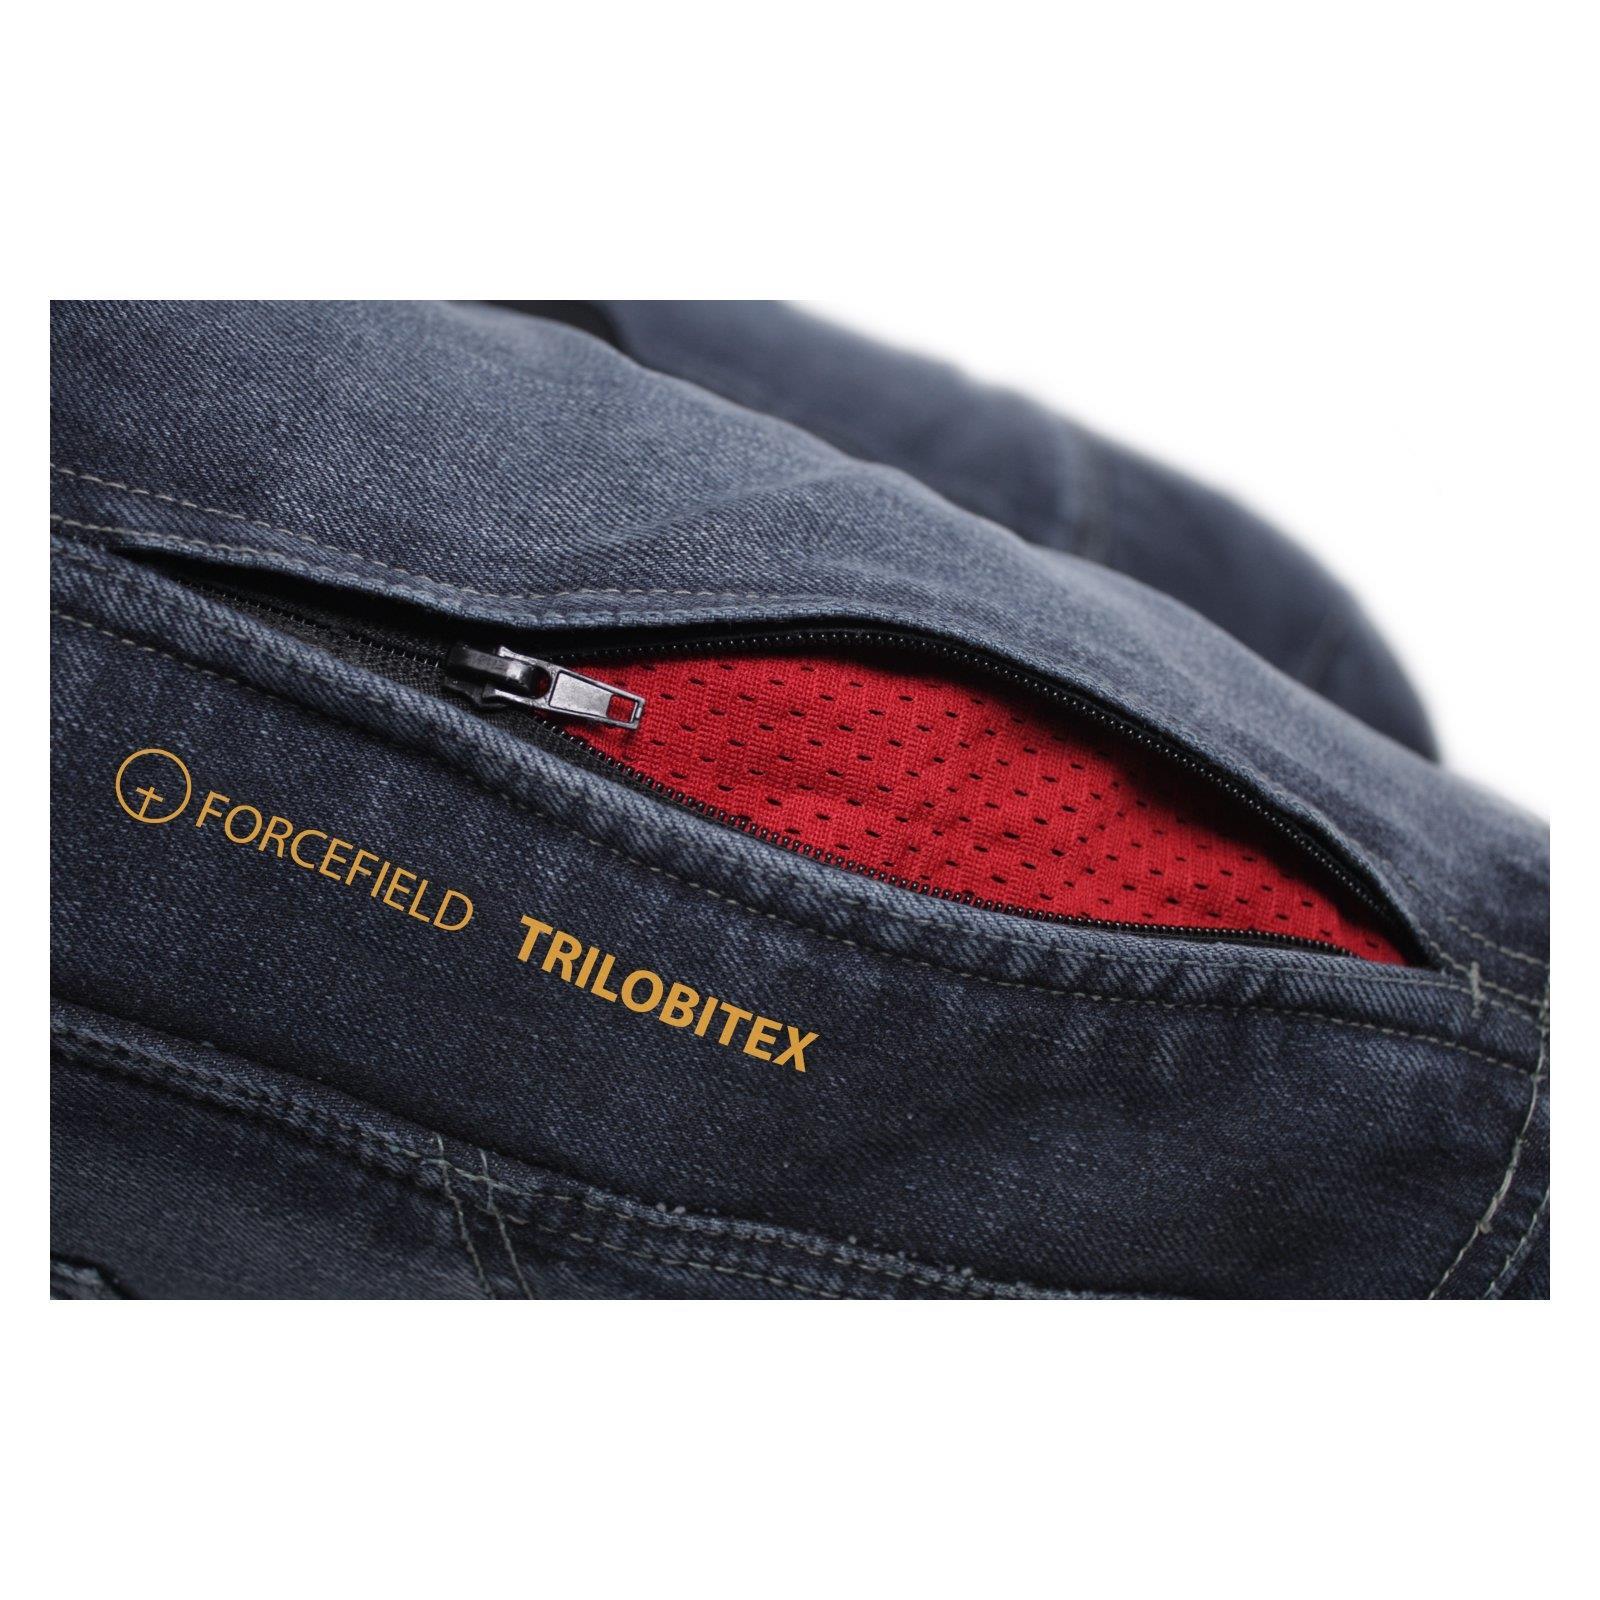 Trilobite-Pantaloni-Moto-Jeans-Abbigliamento-Parado-MICAS-URBAN-DUAL-PANTS-ACID miniatura 20